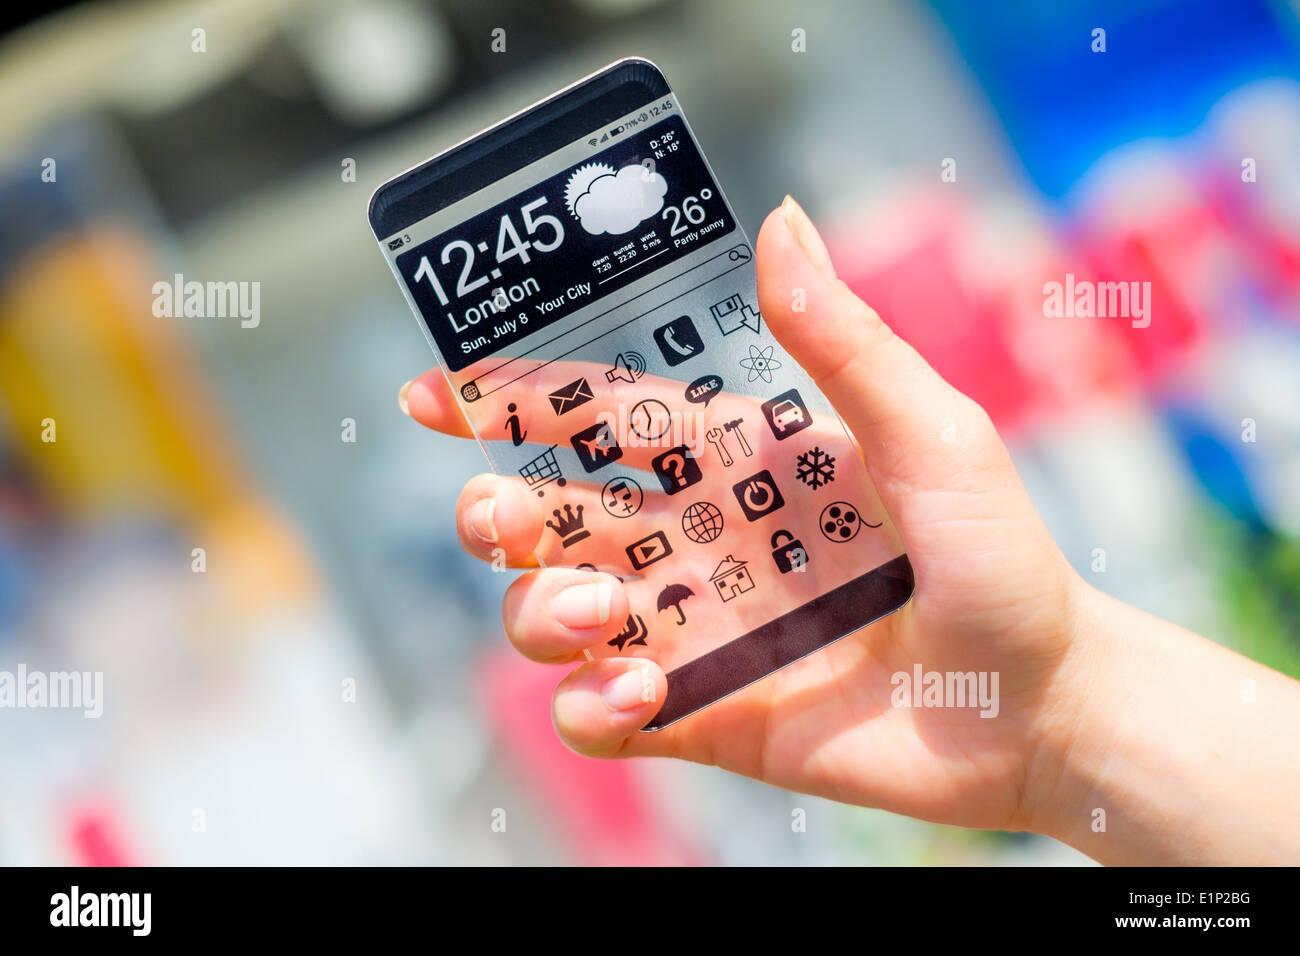 Smartphone con pantalla transparente en manos humanas. Imagen De Stock